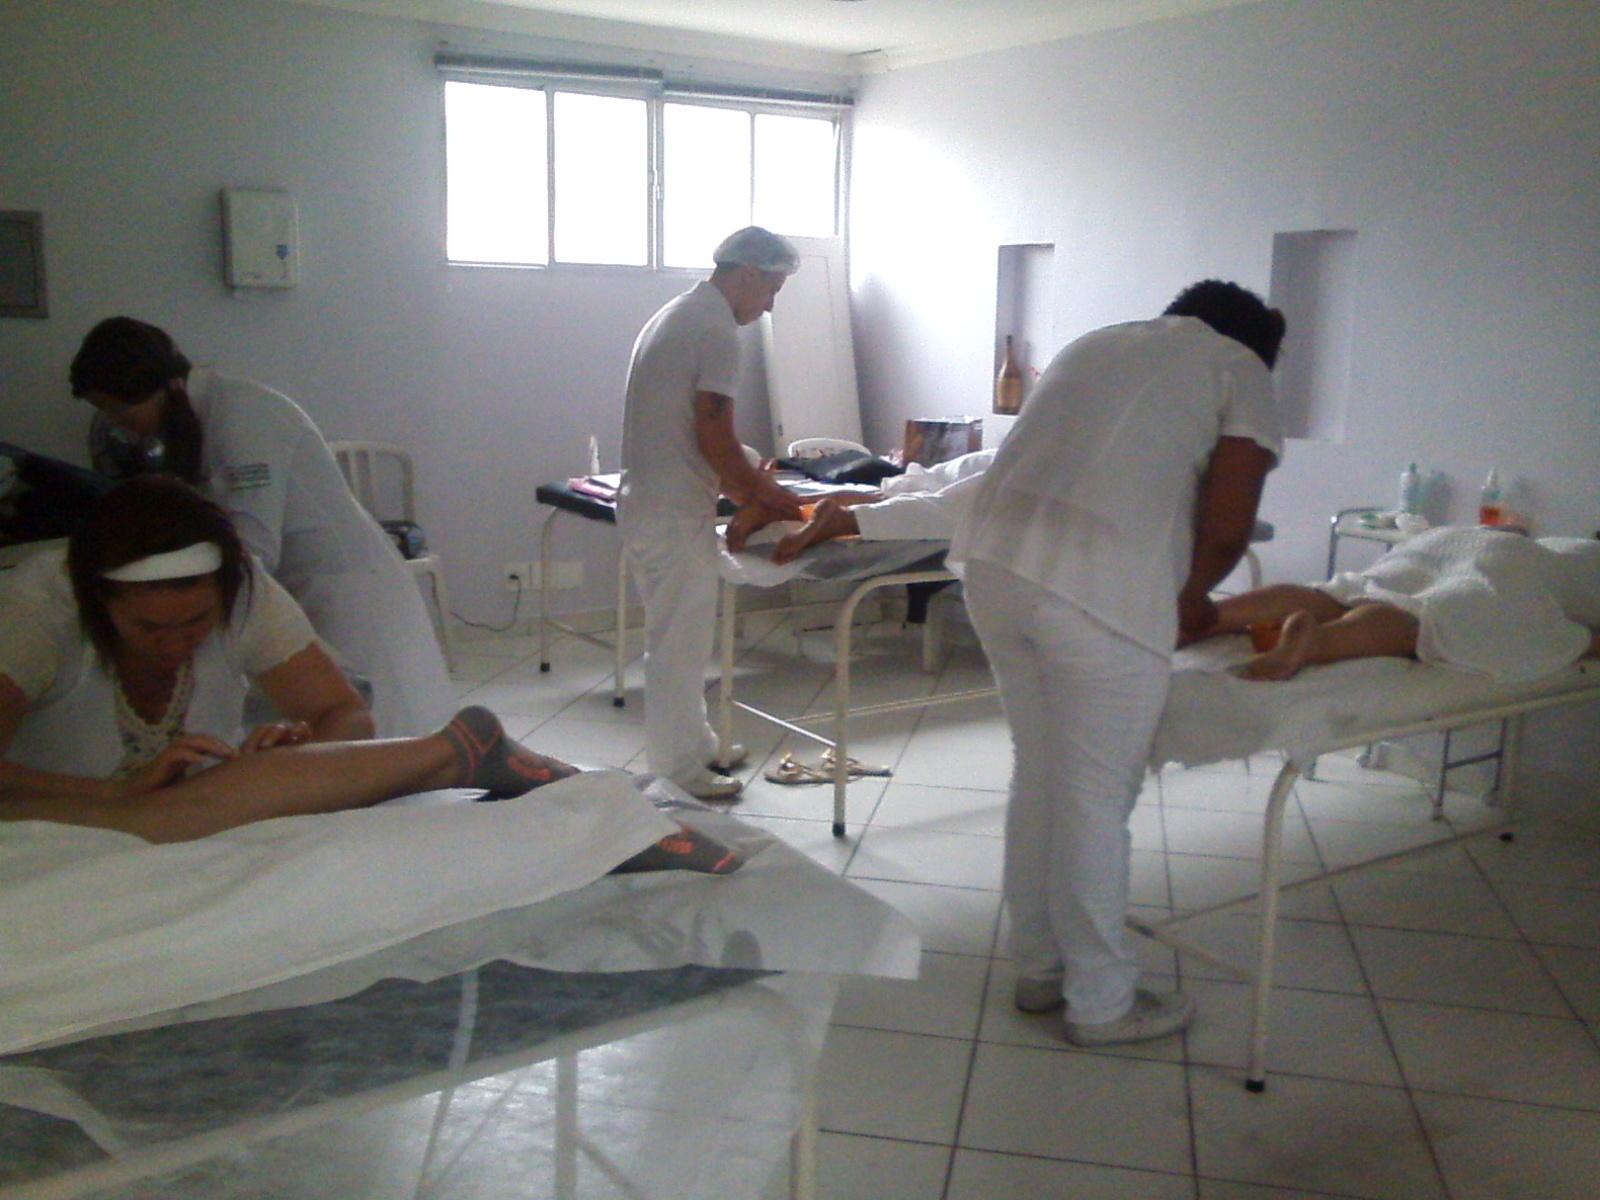 CURSOS CURSO DE TÉCNICAS  E MASSAGENS  esteticista massoterapeuta